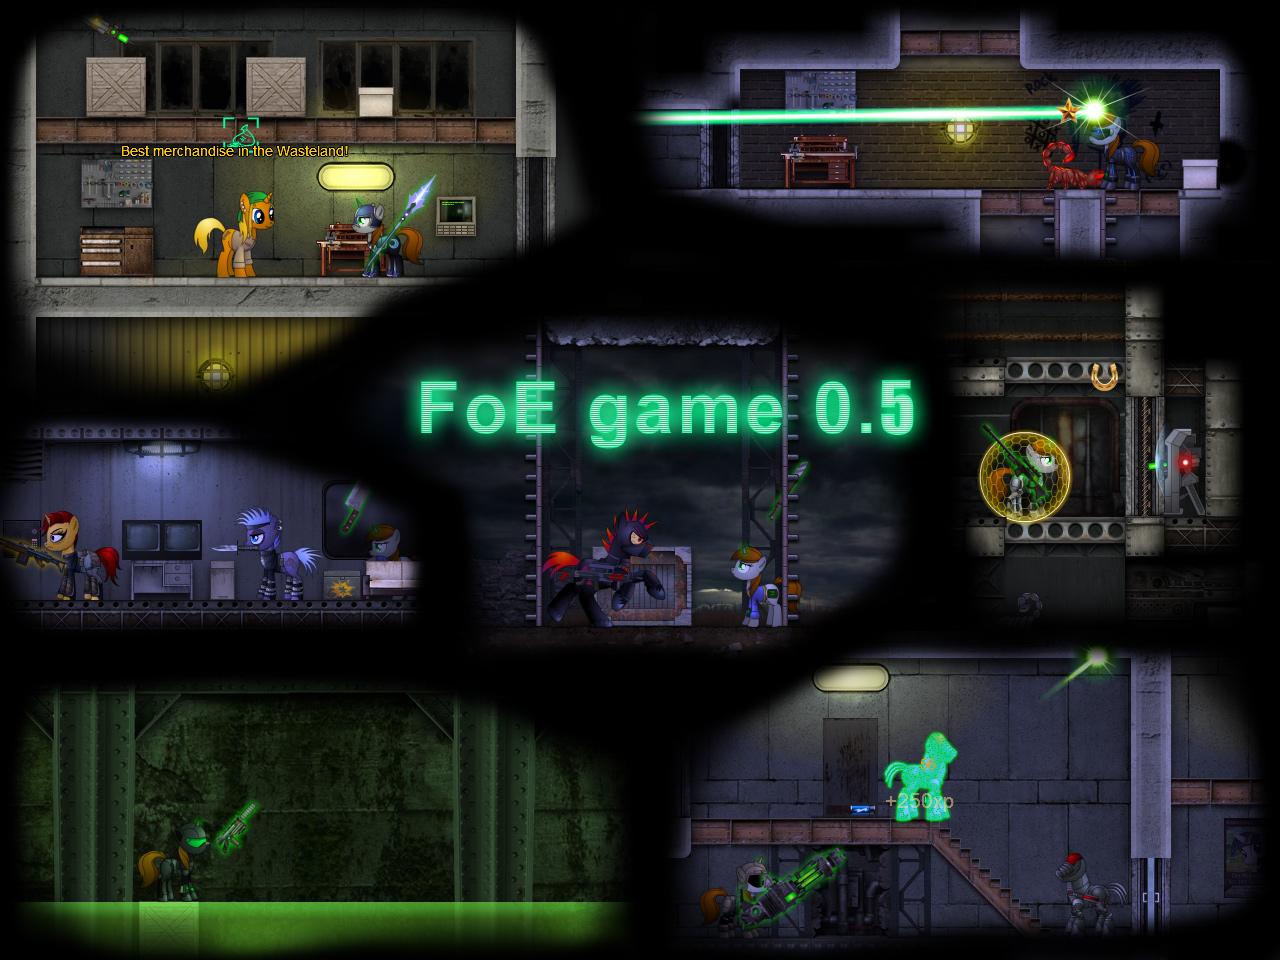 [Obrázek: foe_game_version_0_5_by_empalu-dbbiwob.jpg]